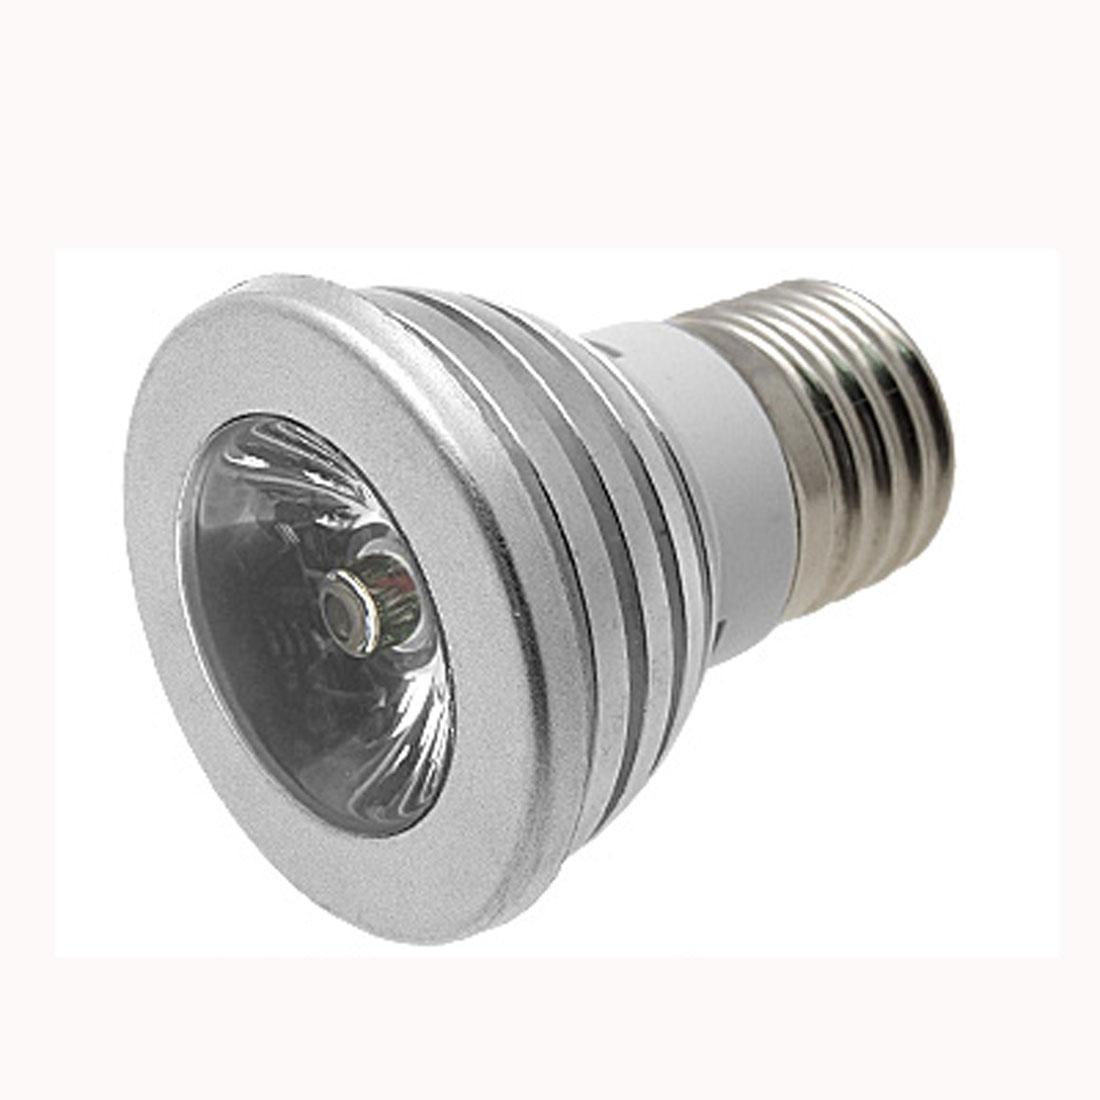 E27 Multicolor LED Light Bulb with Remote Control